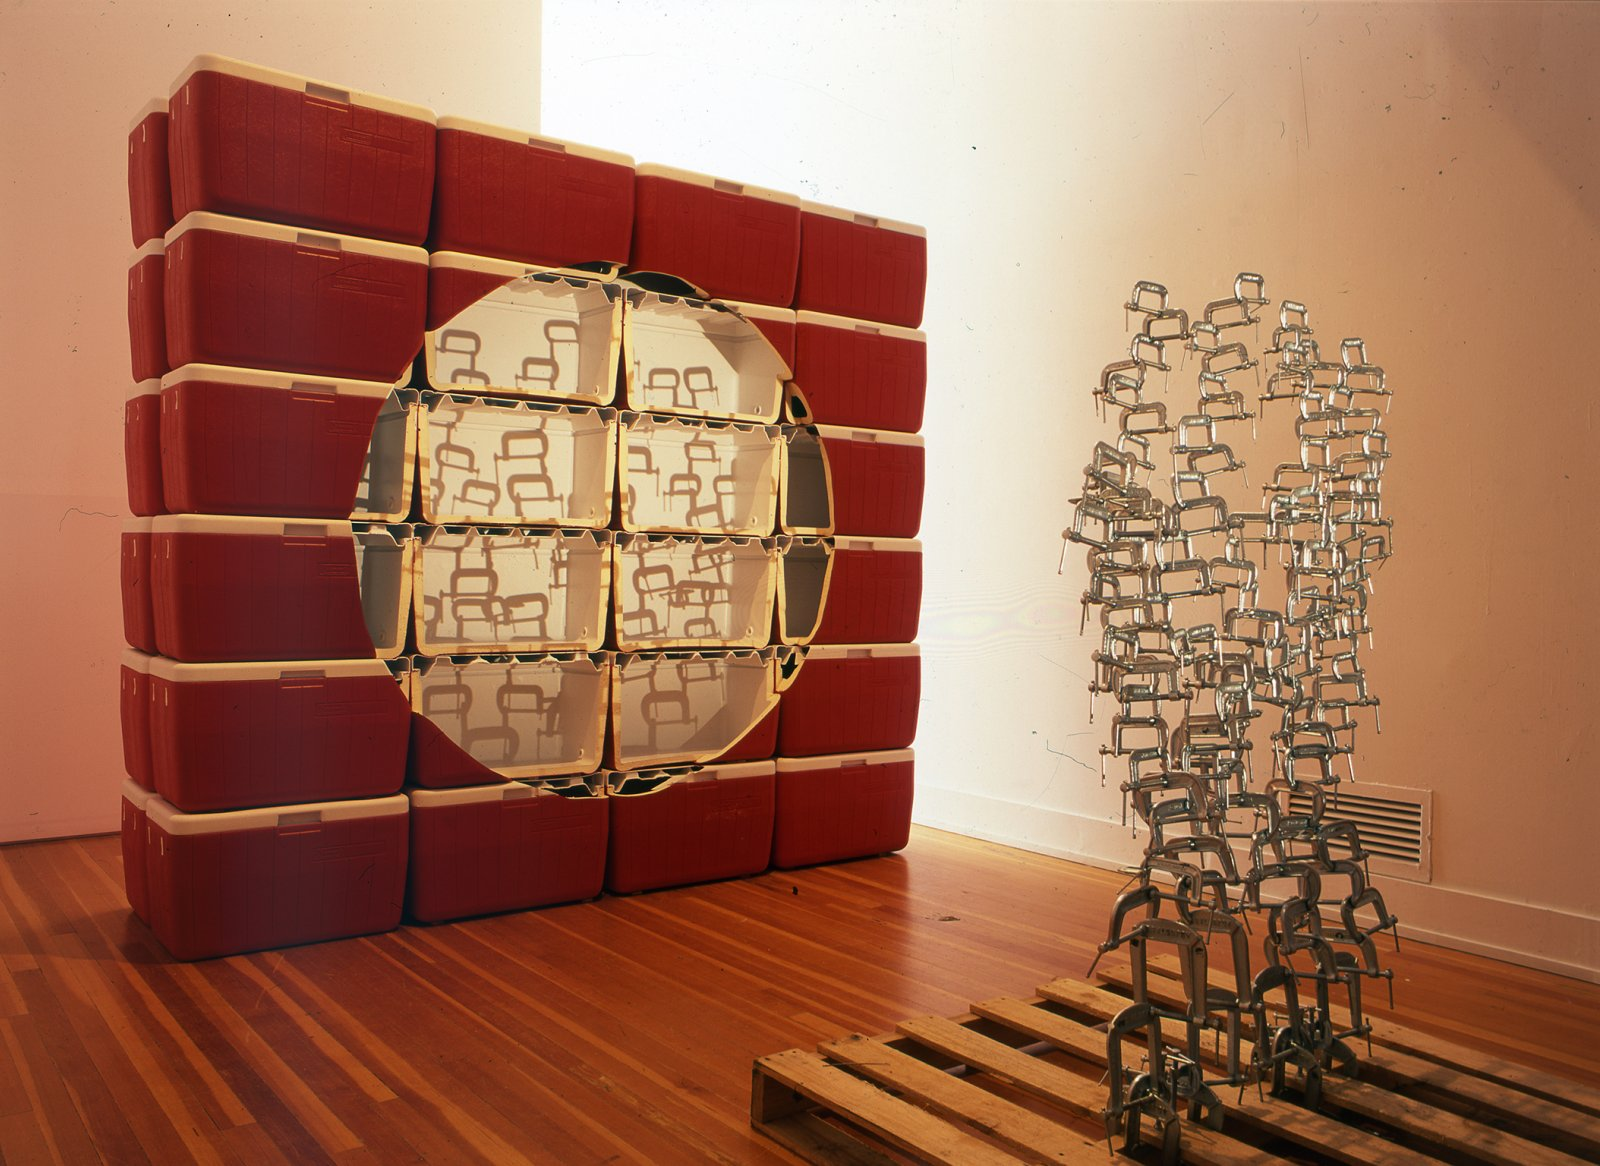 Brian Jungen,Void, 2002,coleman coolers, wooden palette, metal clamps, light,87 x 96 x 27 in. (221 x 244 x 69 cm)